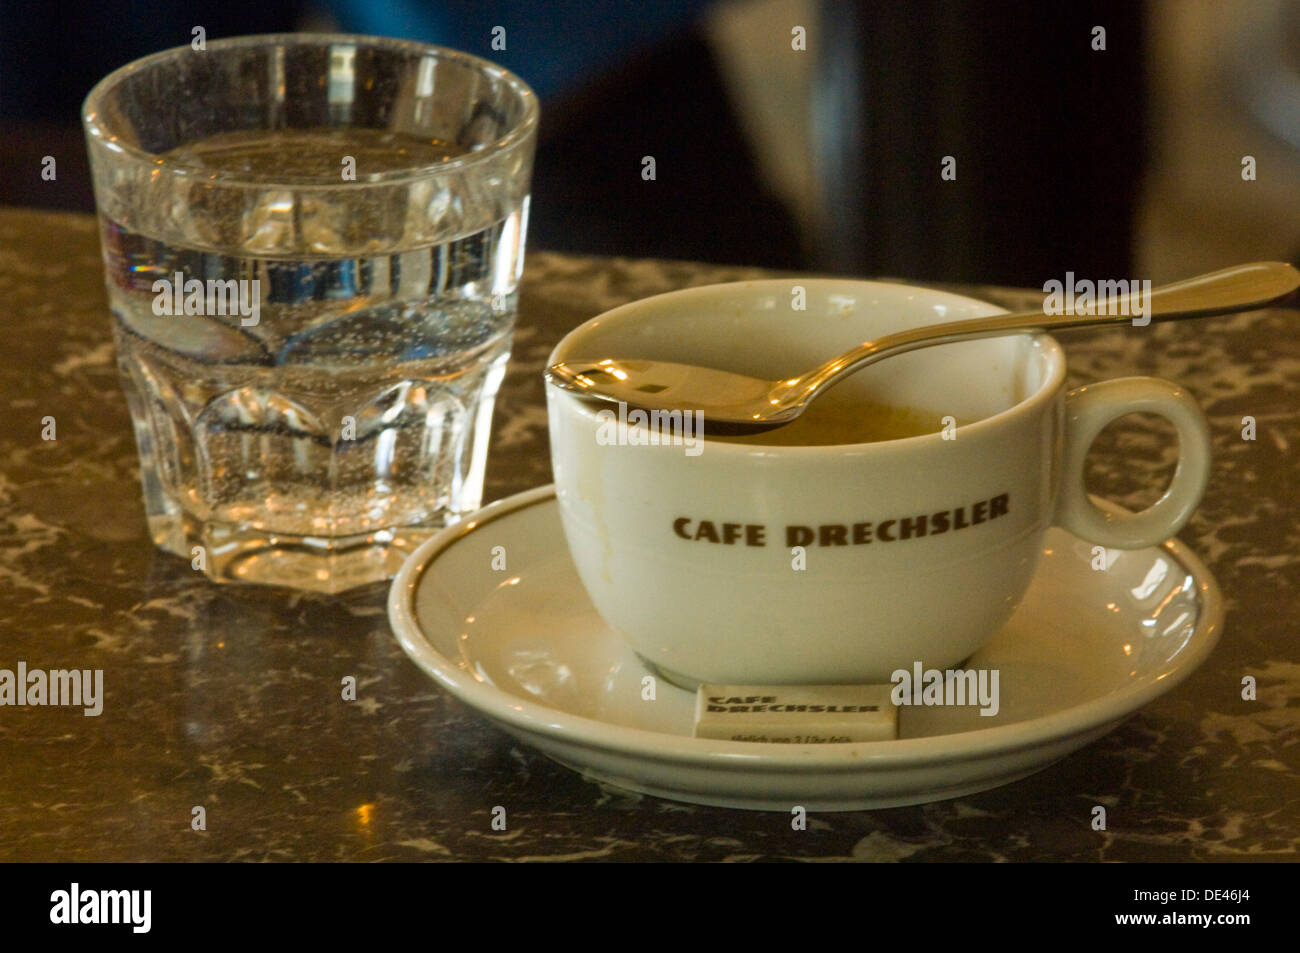 Cafe Drechsler Wien